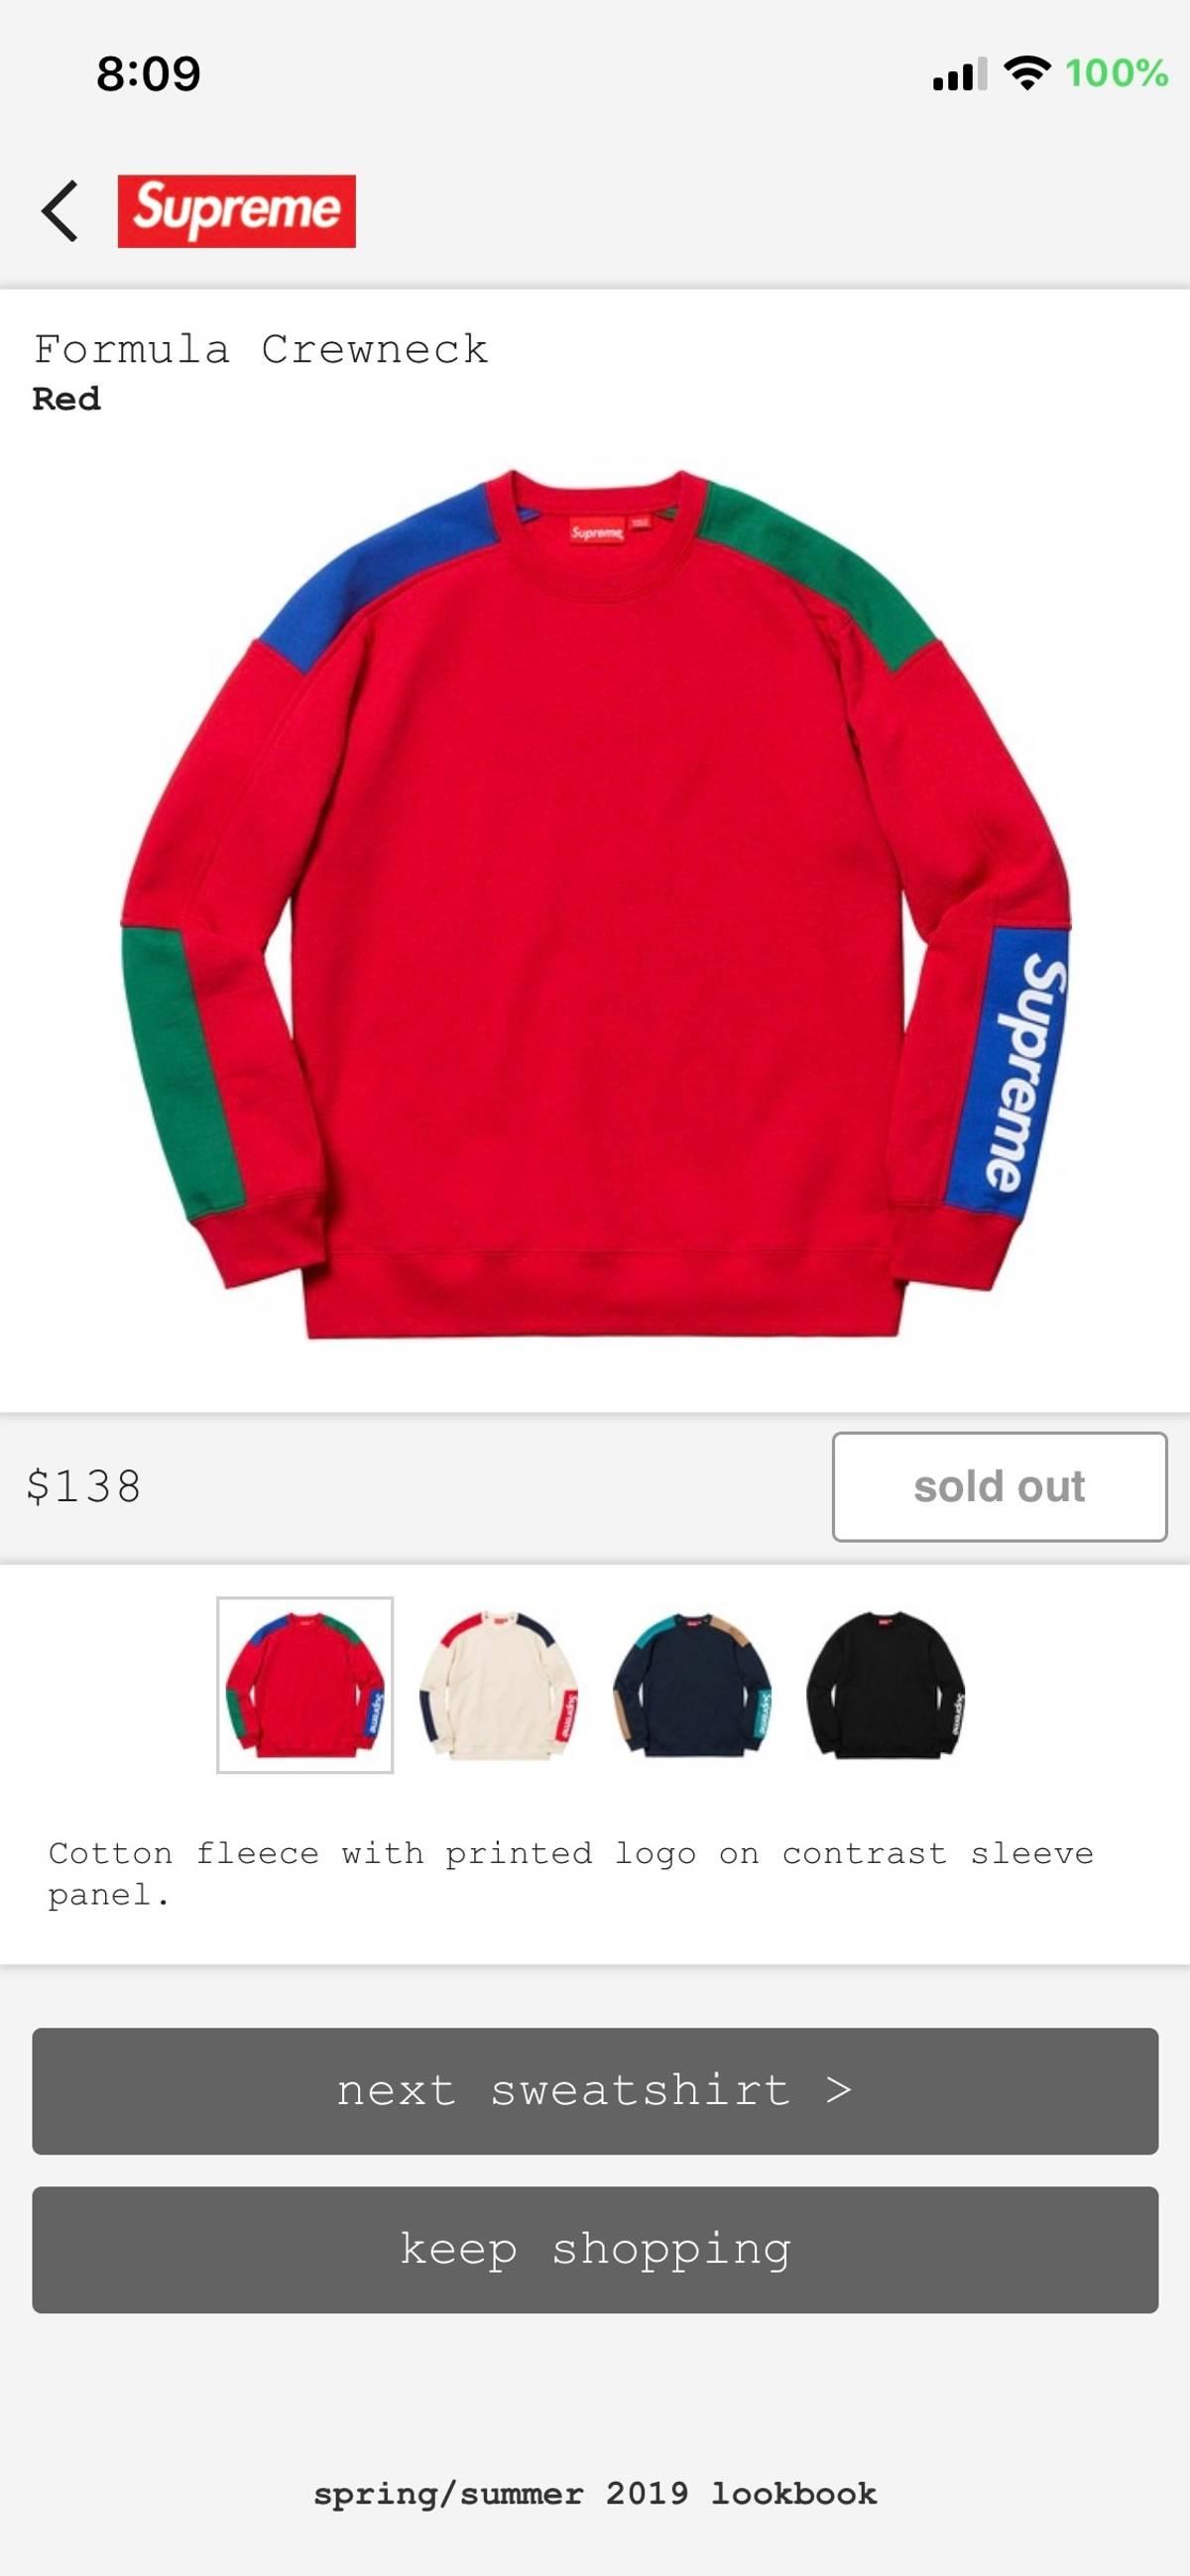 a4557ff6ecfa Supreme Supreme formula crewneck Red M Size m - Long Sleeve T-Shirts for  Sale - Grailed